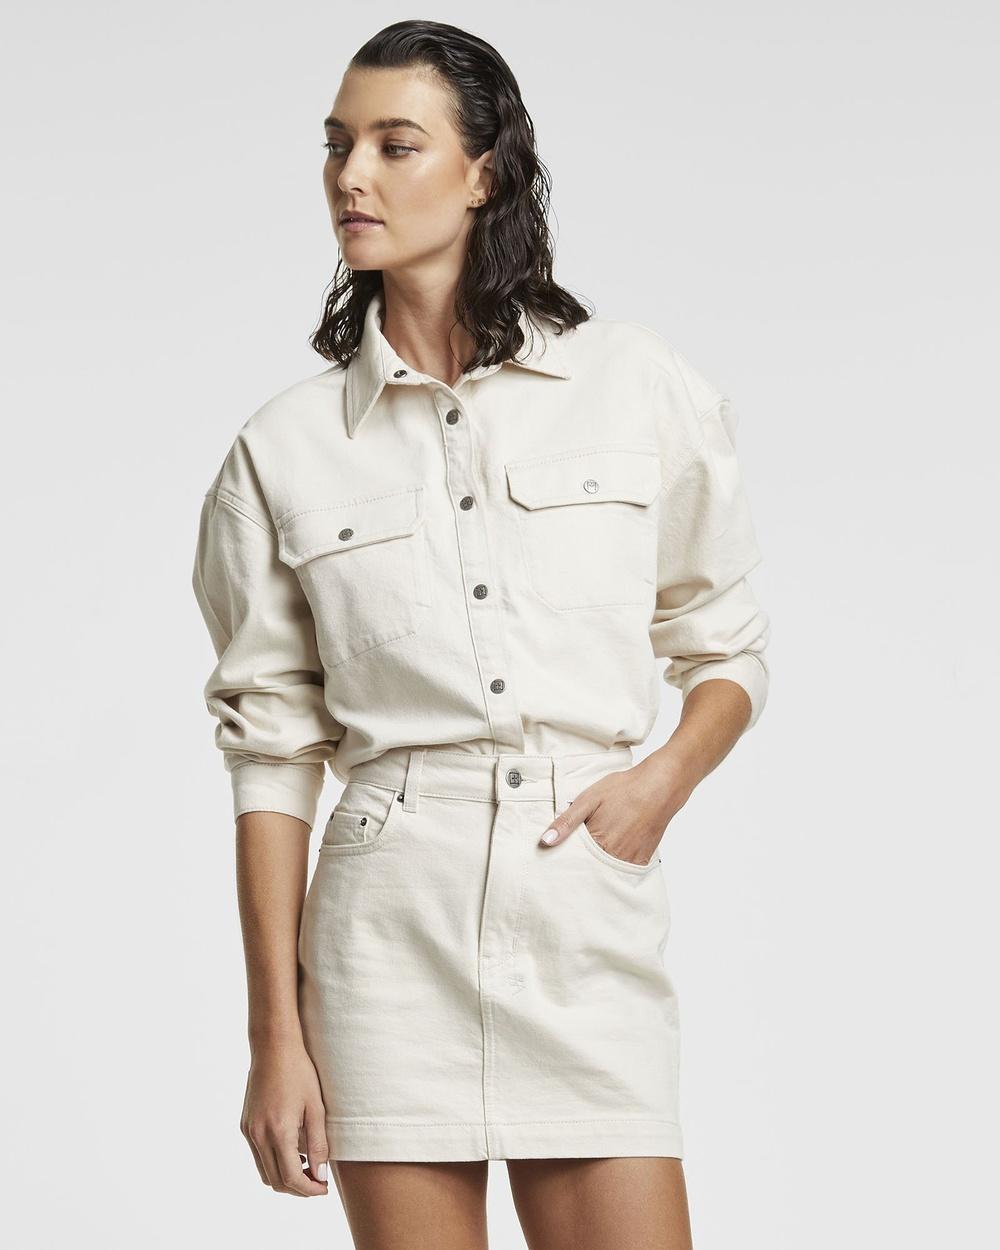 Ksubi Relaxo Shirt Shirts & Polos WHITE